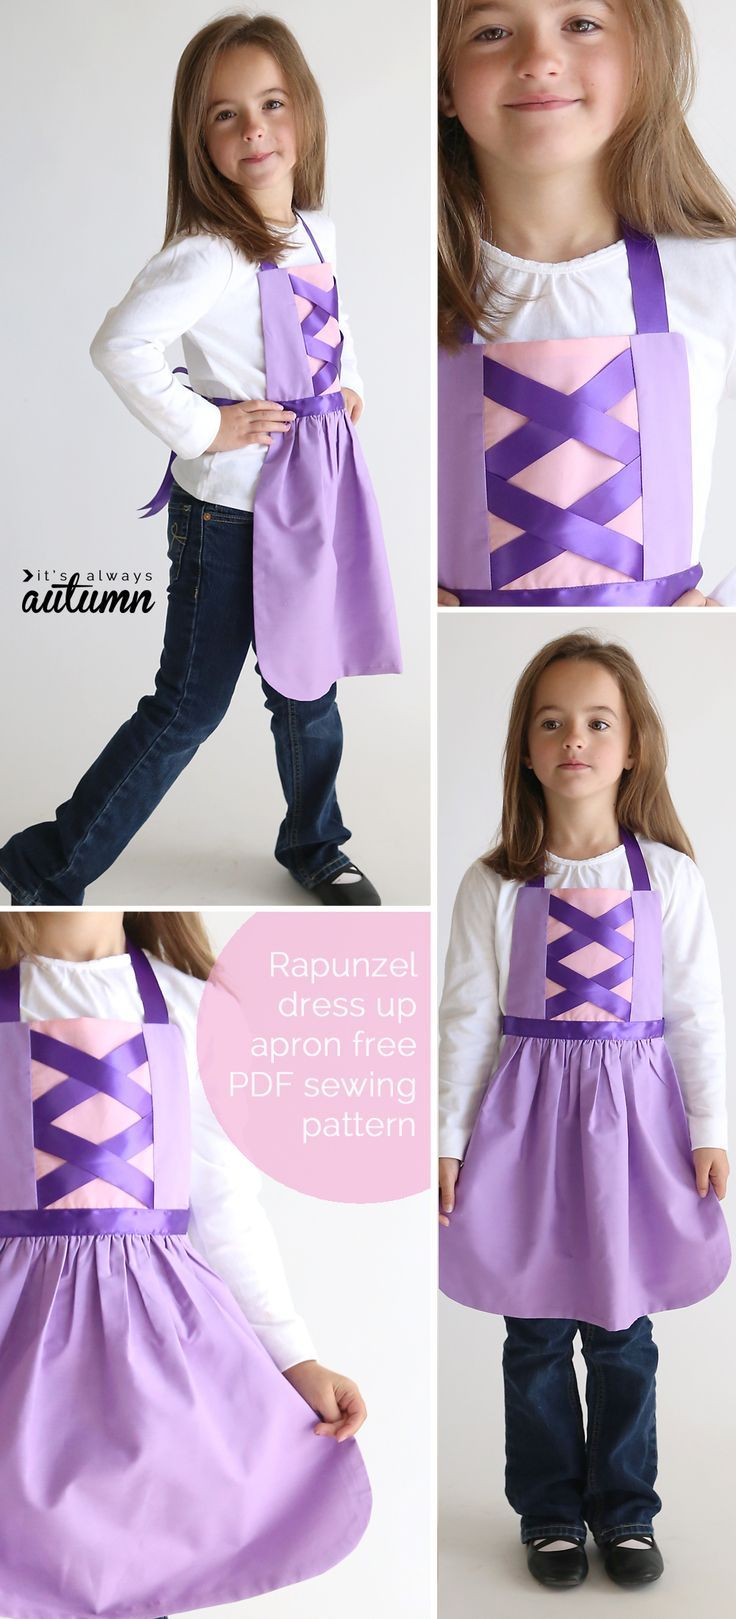 free sewing pattern for Rapunzel dress up apron | Basteln